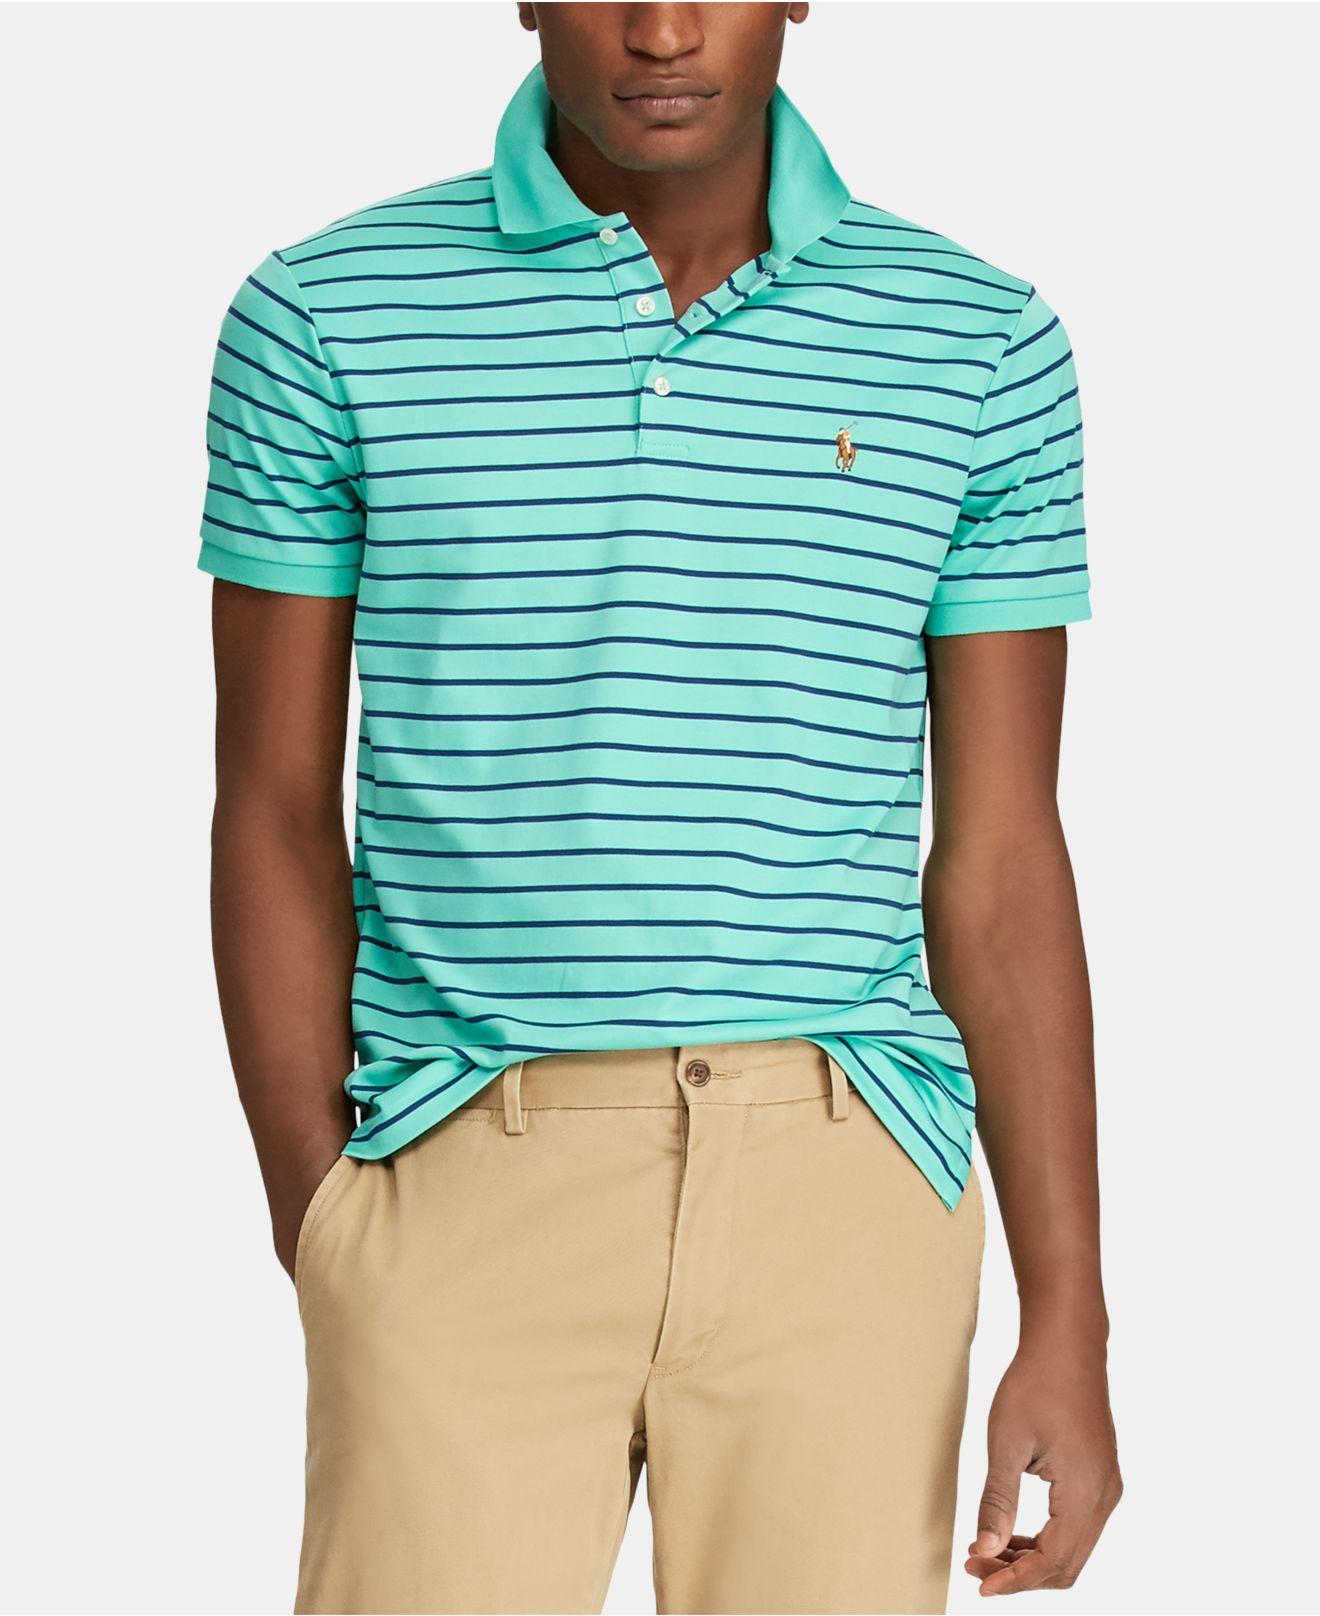 a35beb6e1f5a4 Polo Ralph Lauren. Men s Green Custom Slim Fit ...